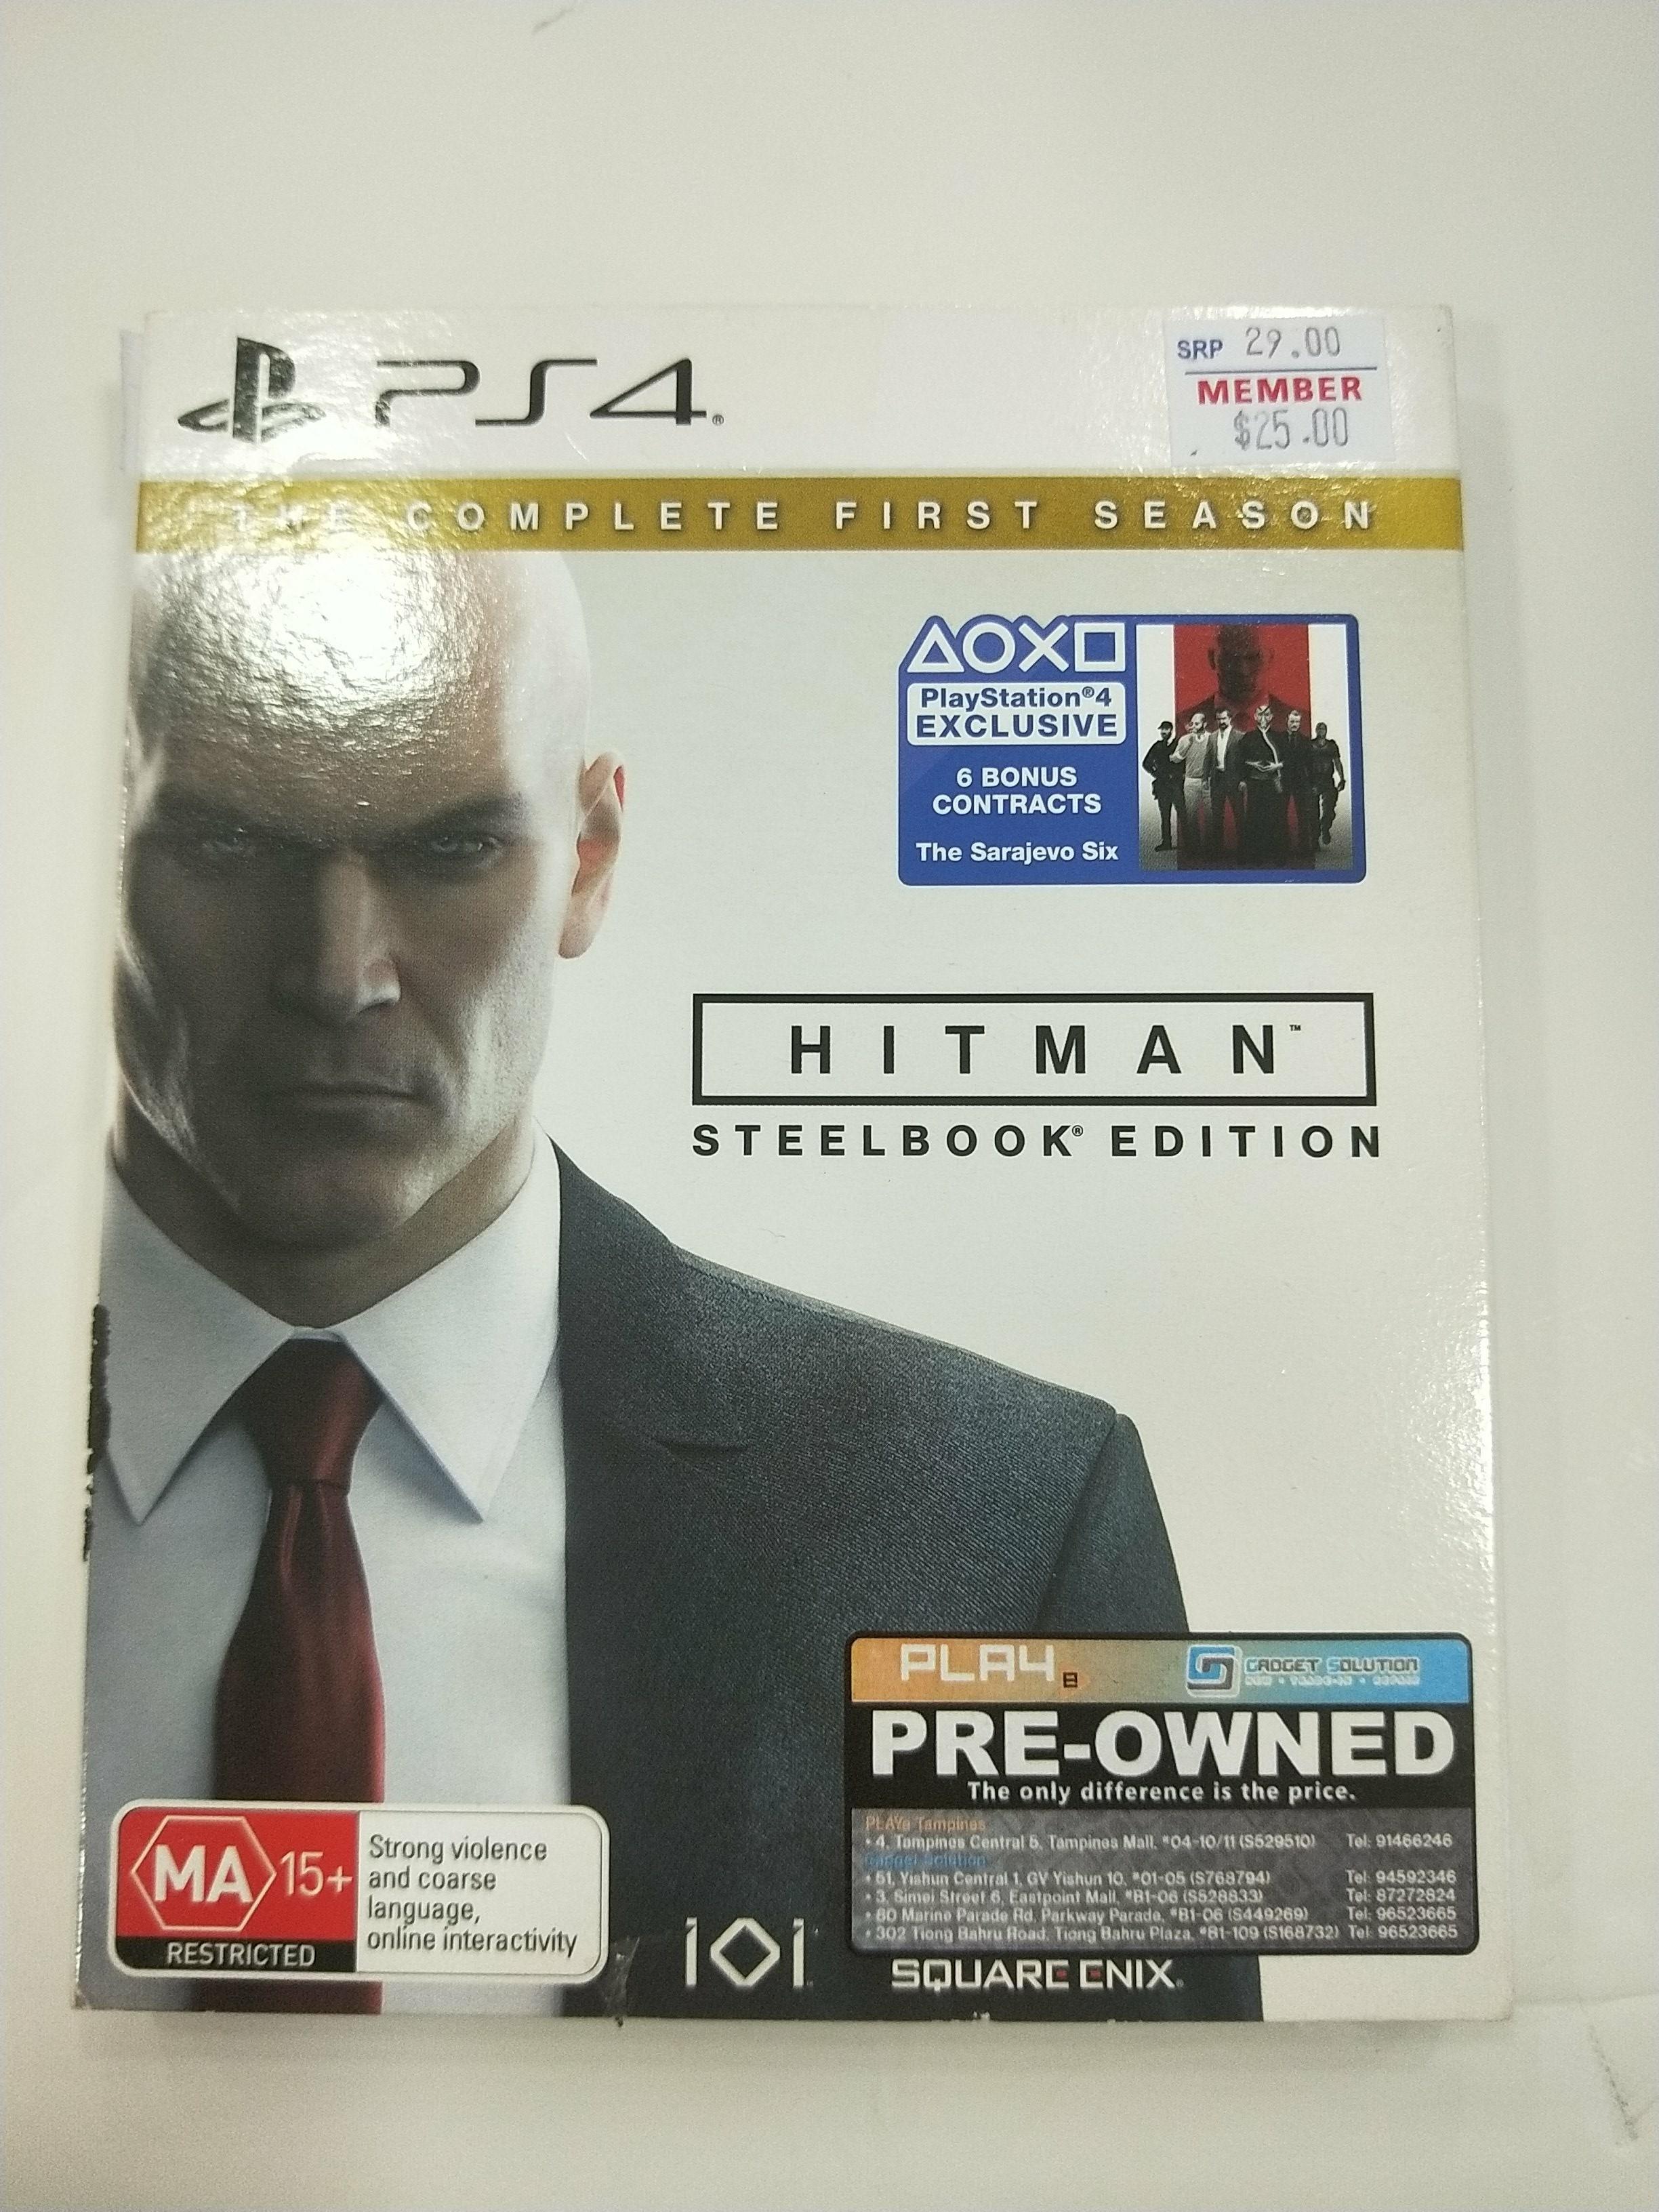 PS4 Hitman Steelbook Edition